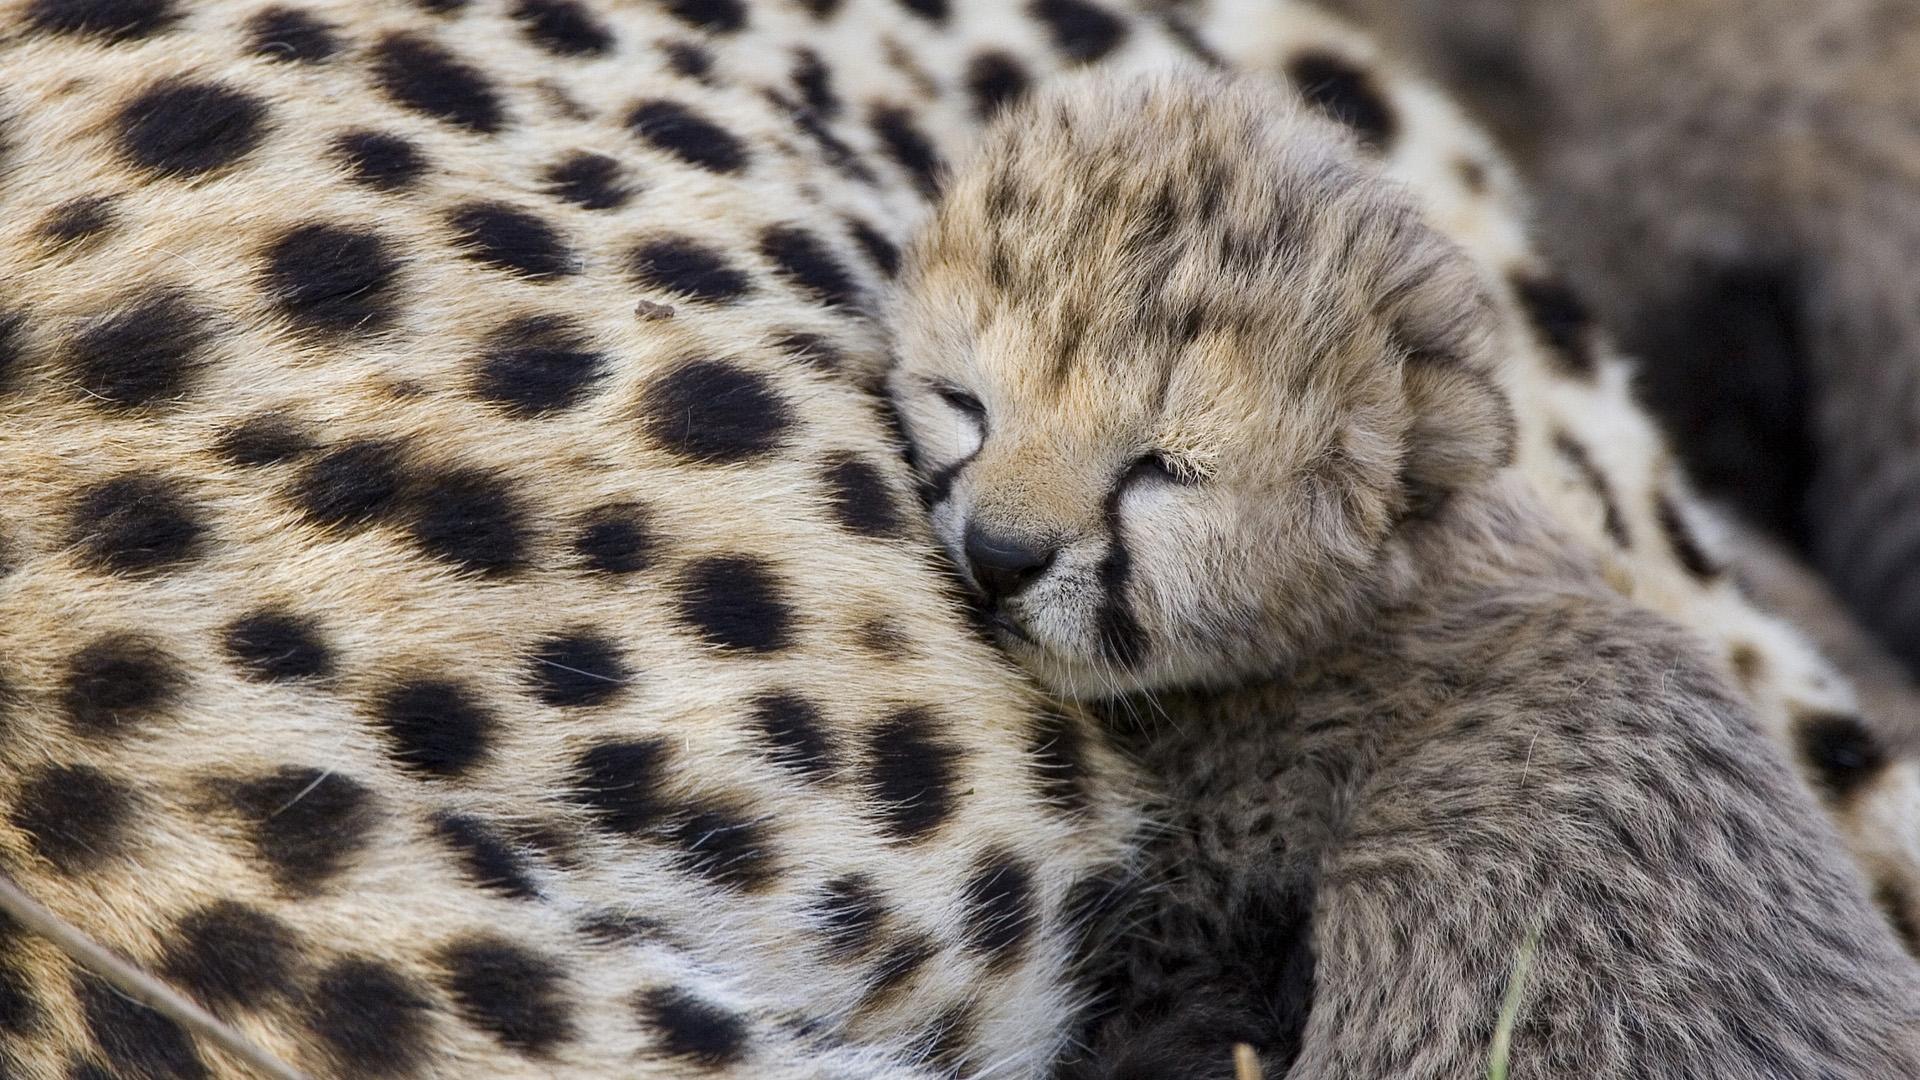 cute baby cheetah wallpaper